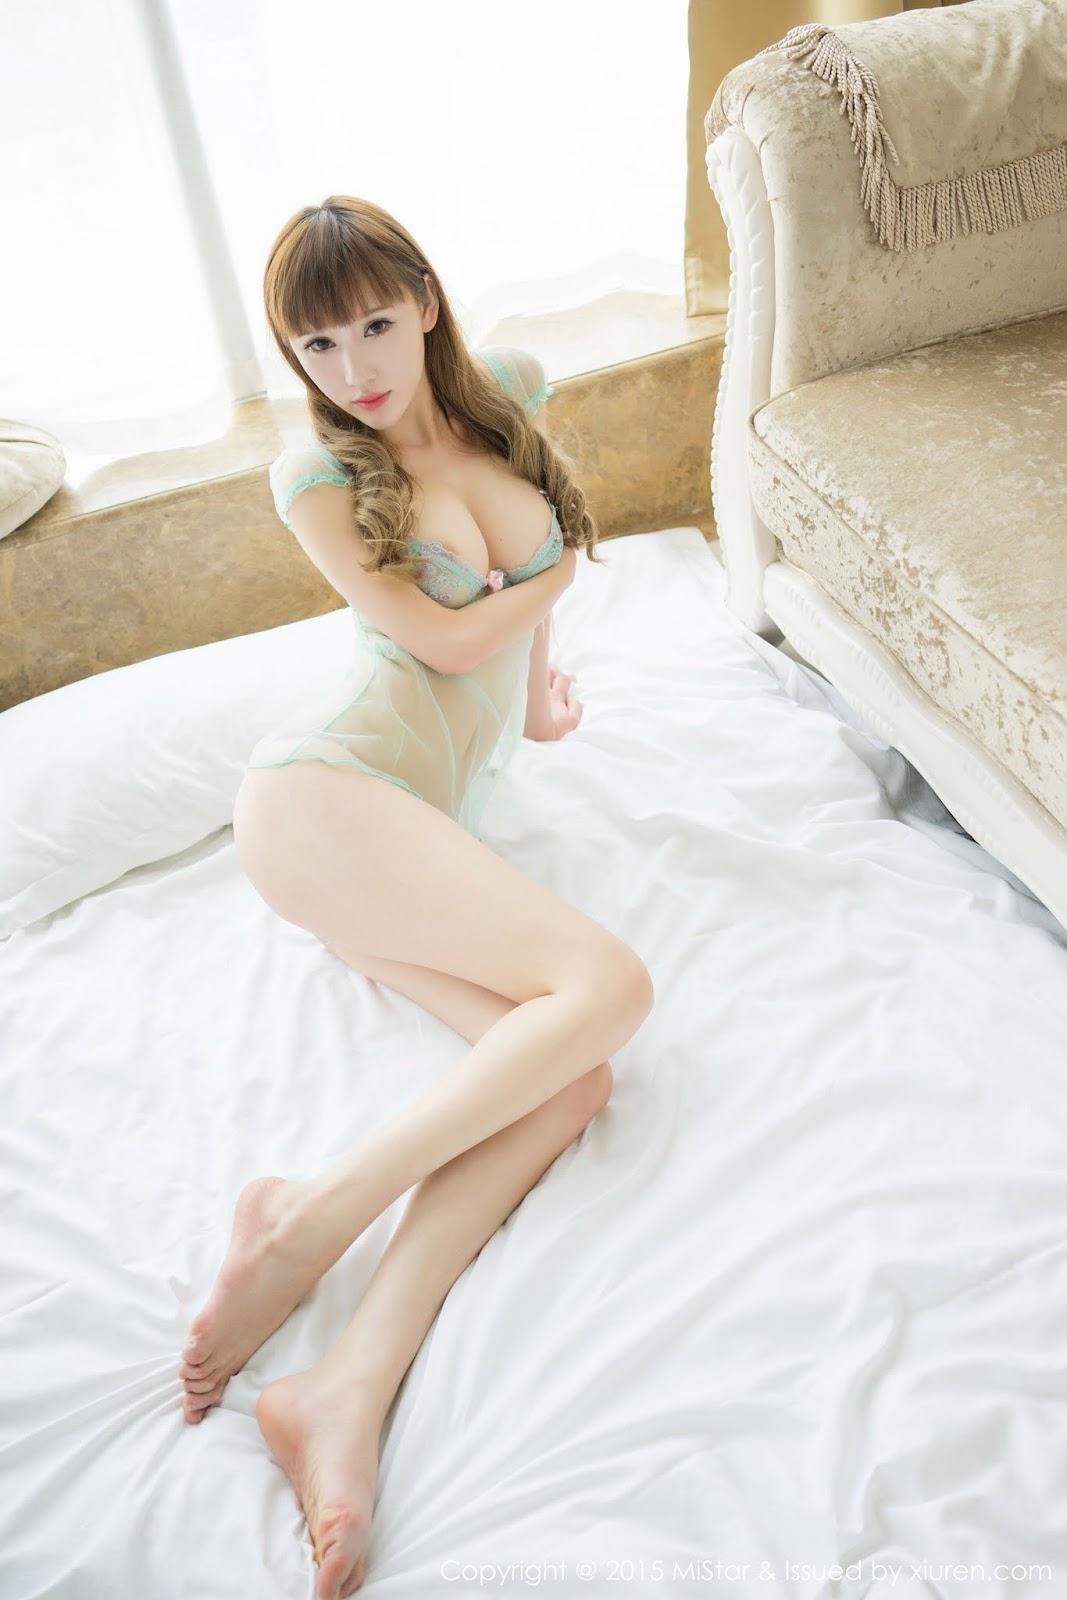 0033 - MiStar Vol.005 Model: 斯戴媛Amy